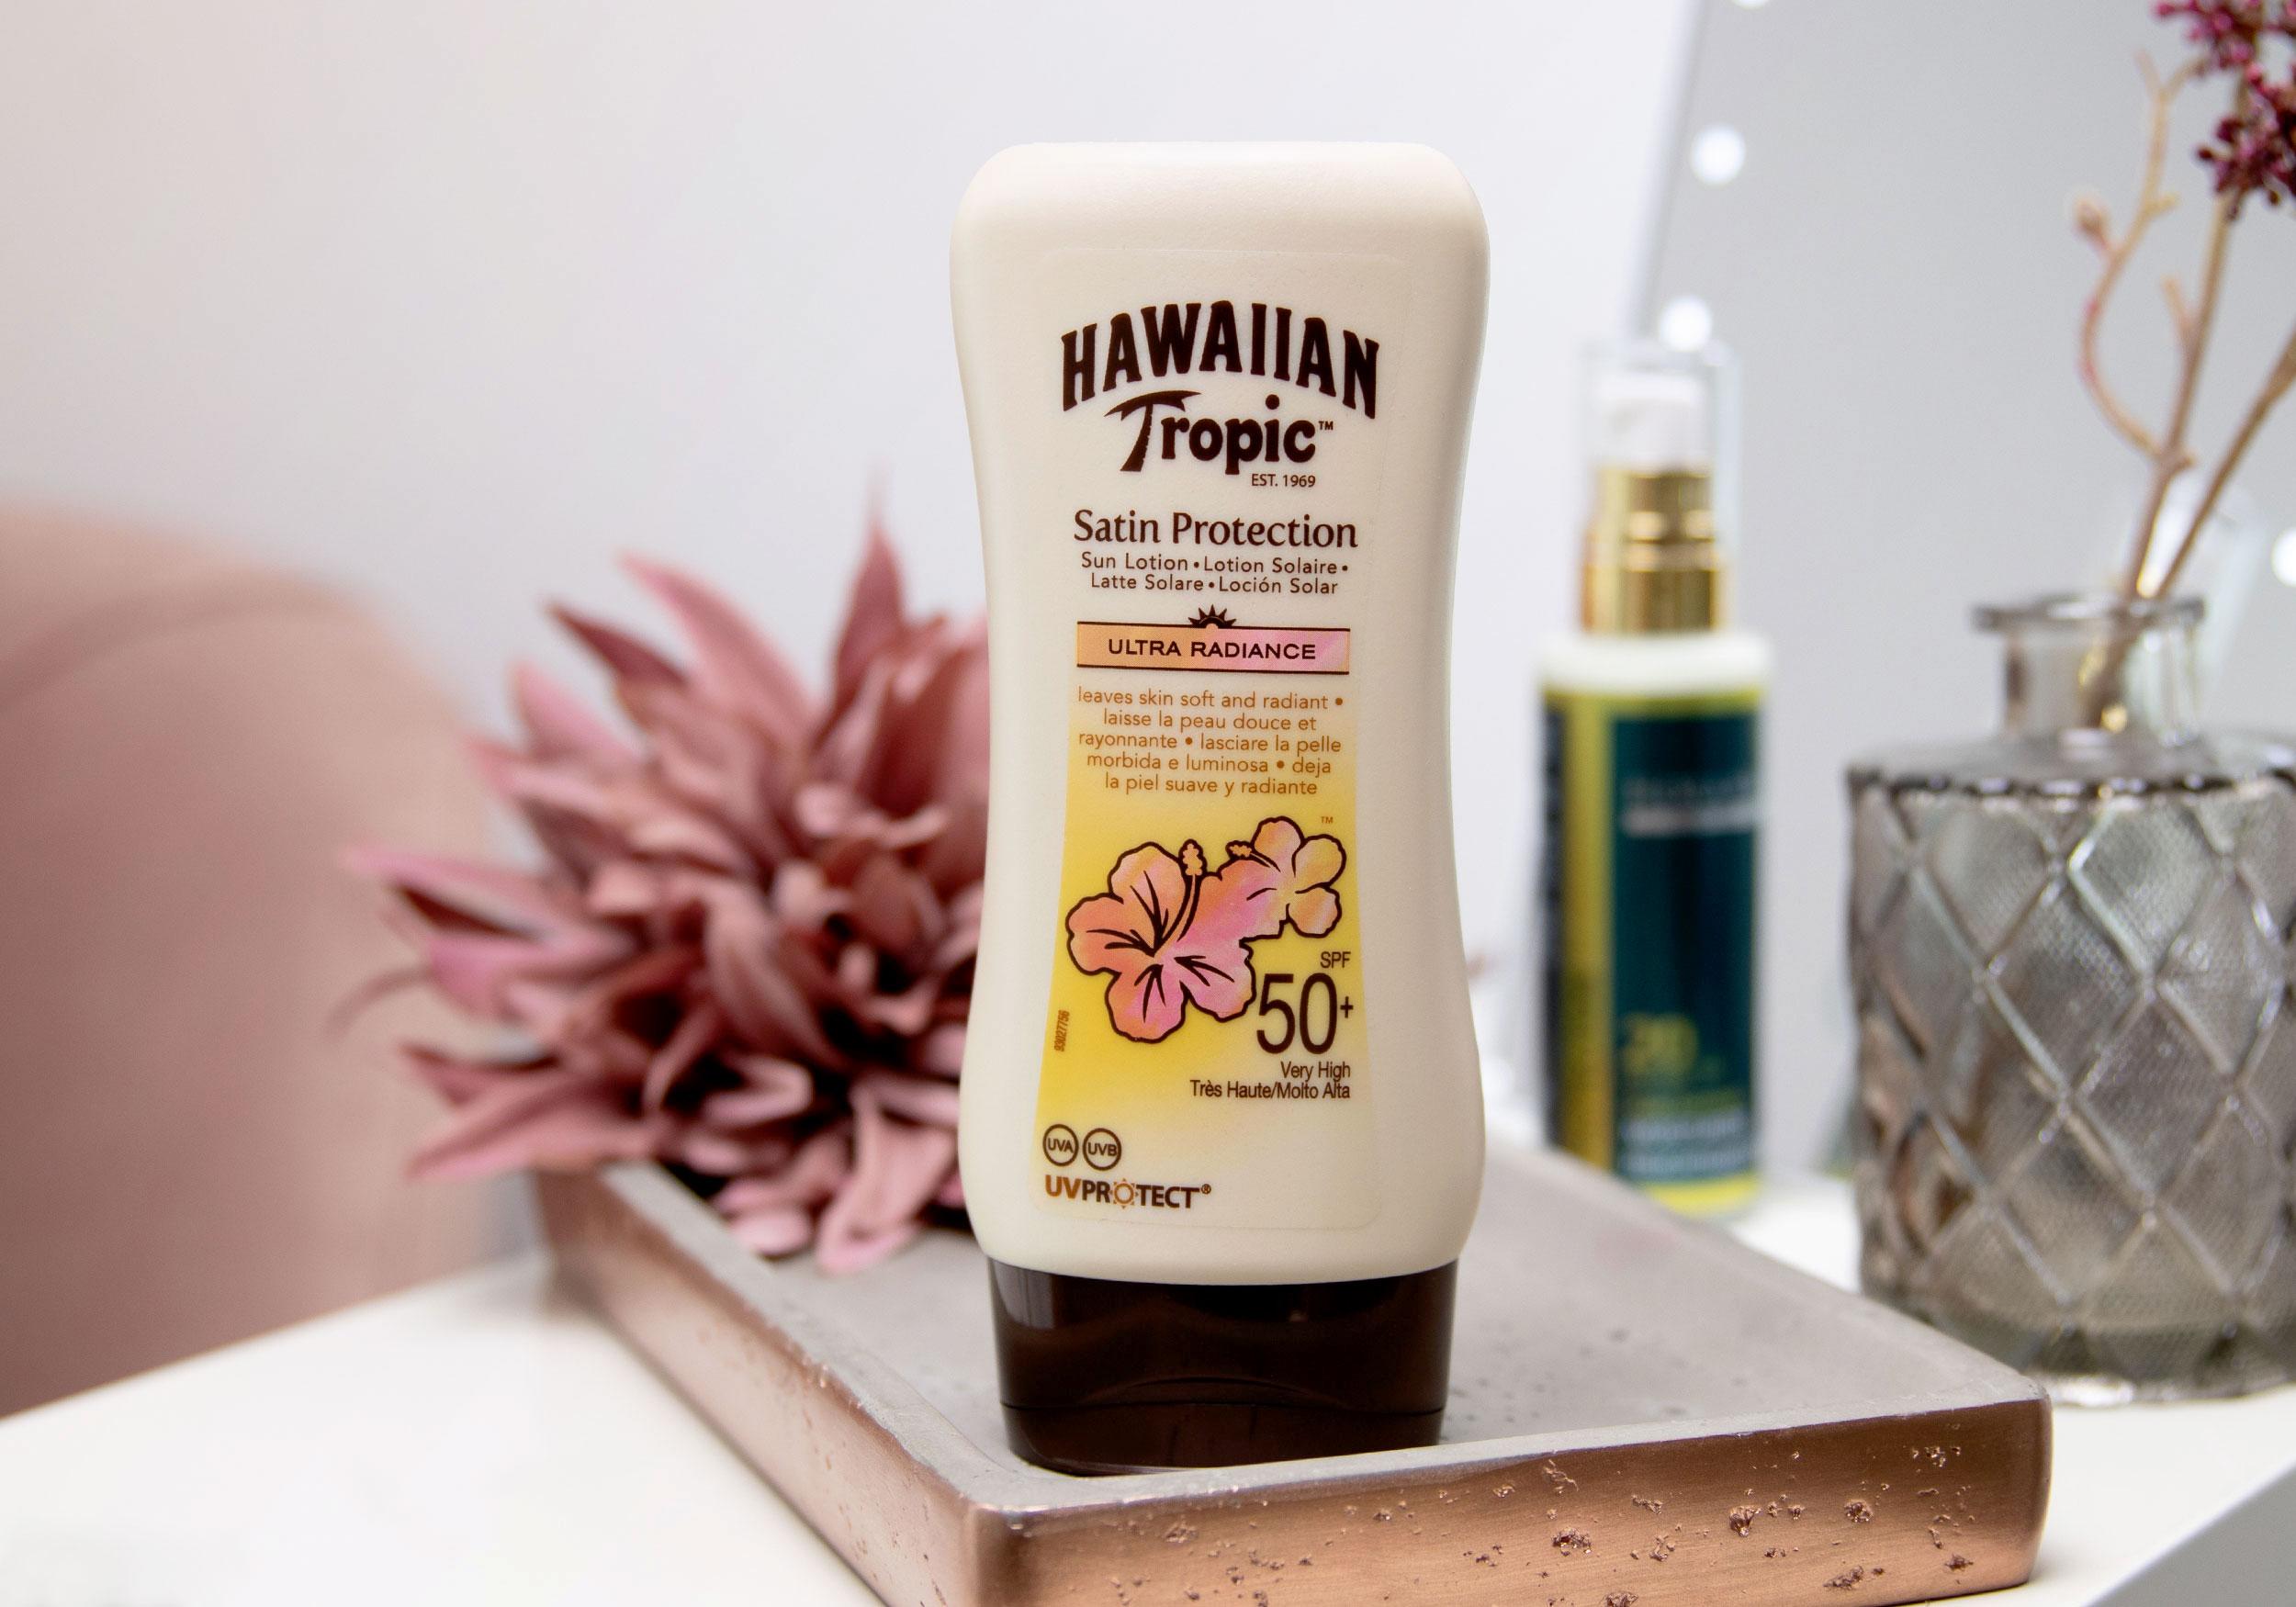 HAWAIIAN TROPIC ULTRA RADIANCE Satin Protection Sun Lotion SPF 50